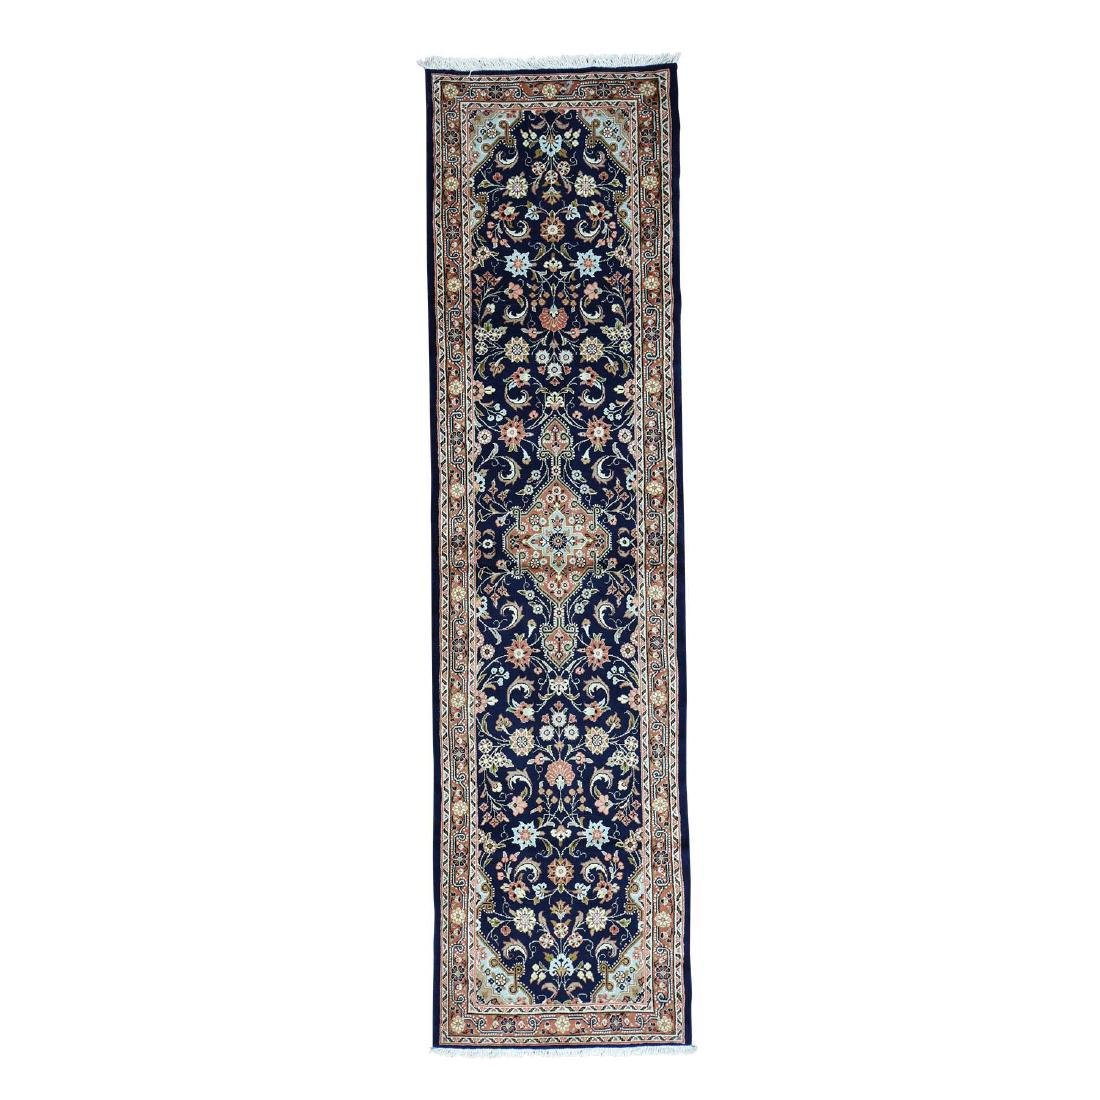 Handmade Persian Hamadan Runner Oriental Rug 2.8x10.2